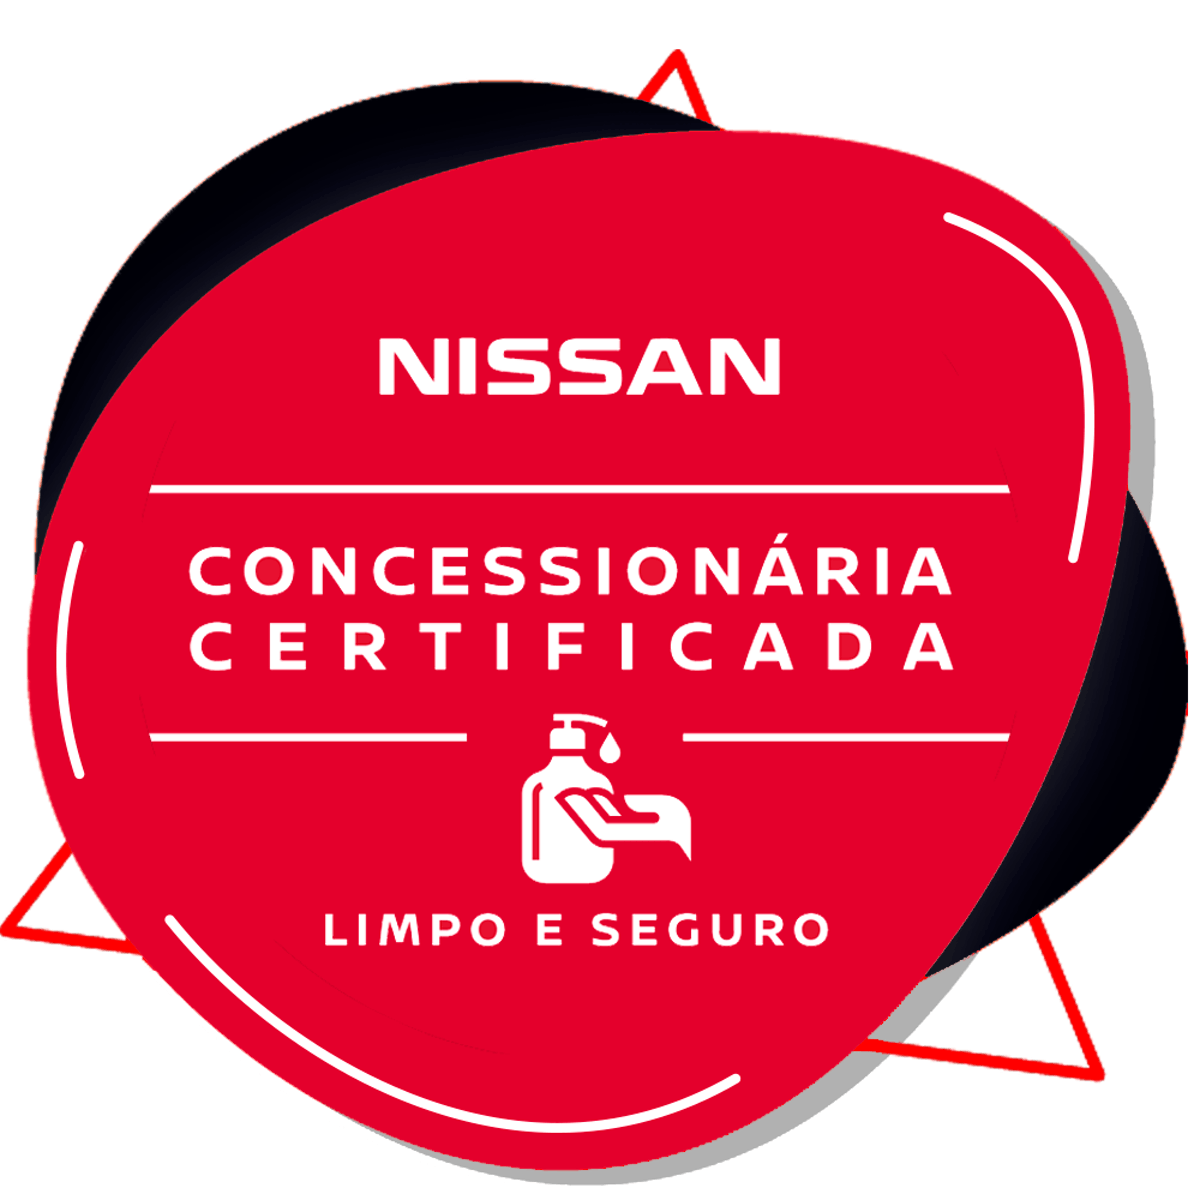 Revisão Premiada Nissan